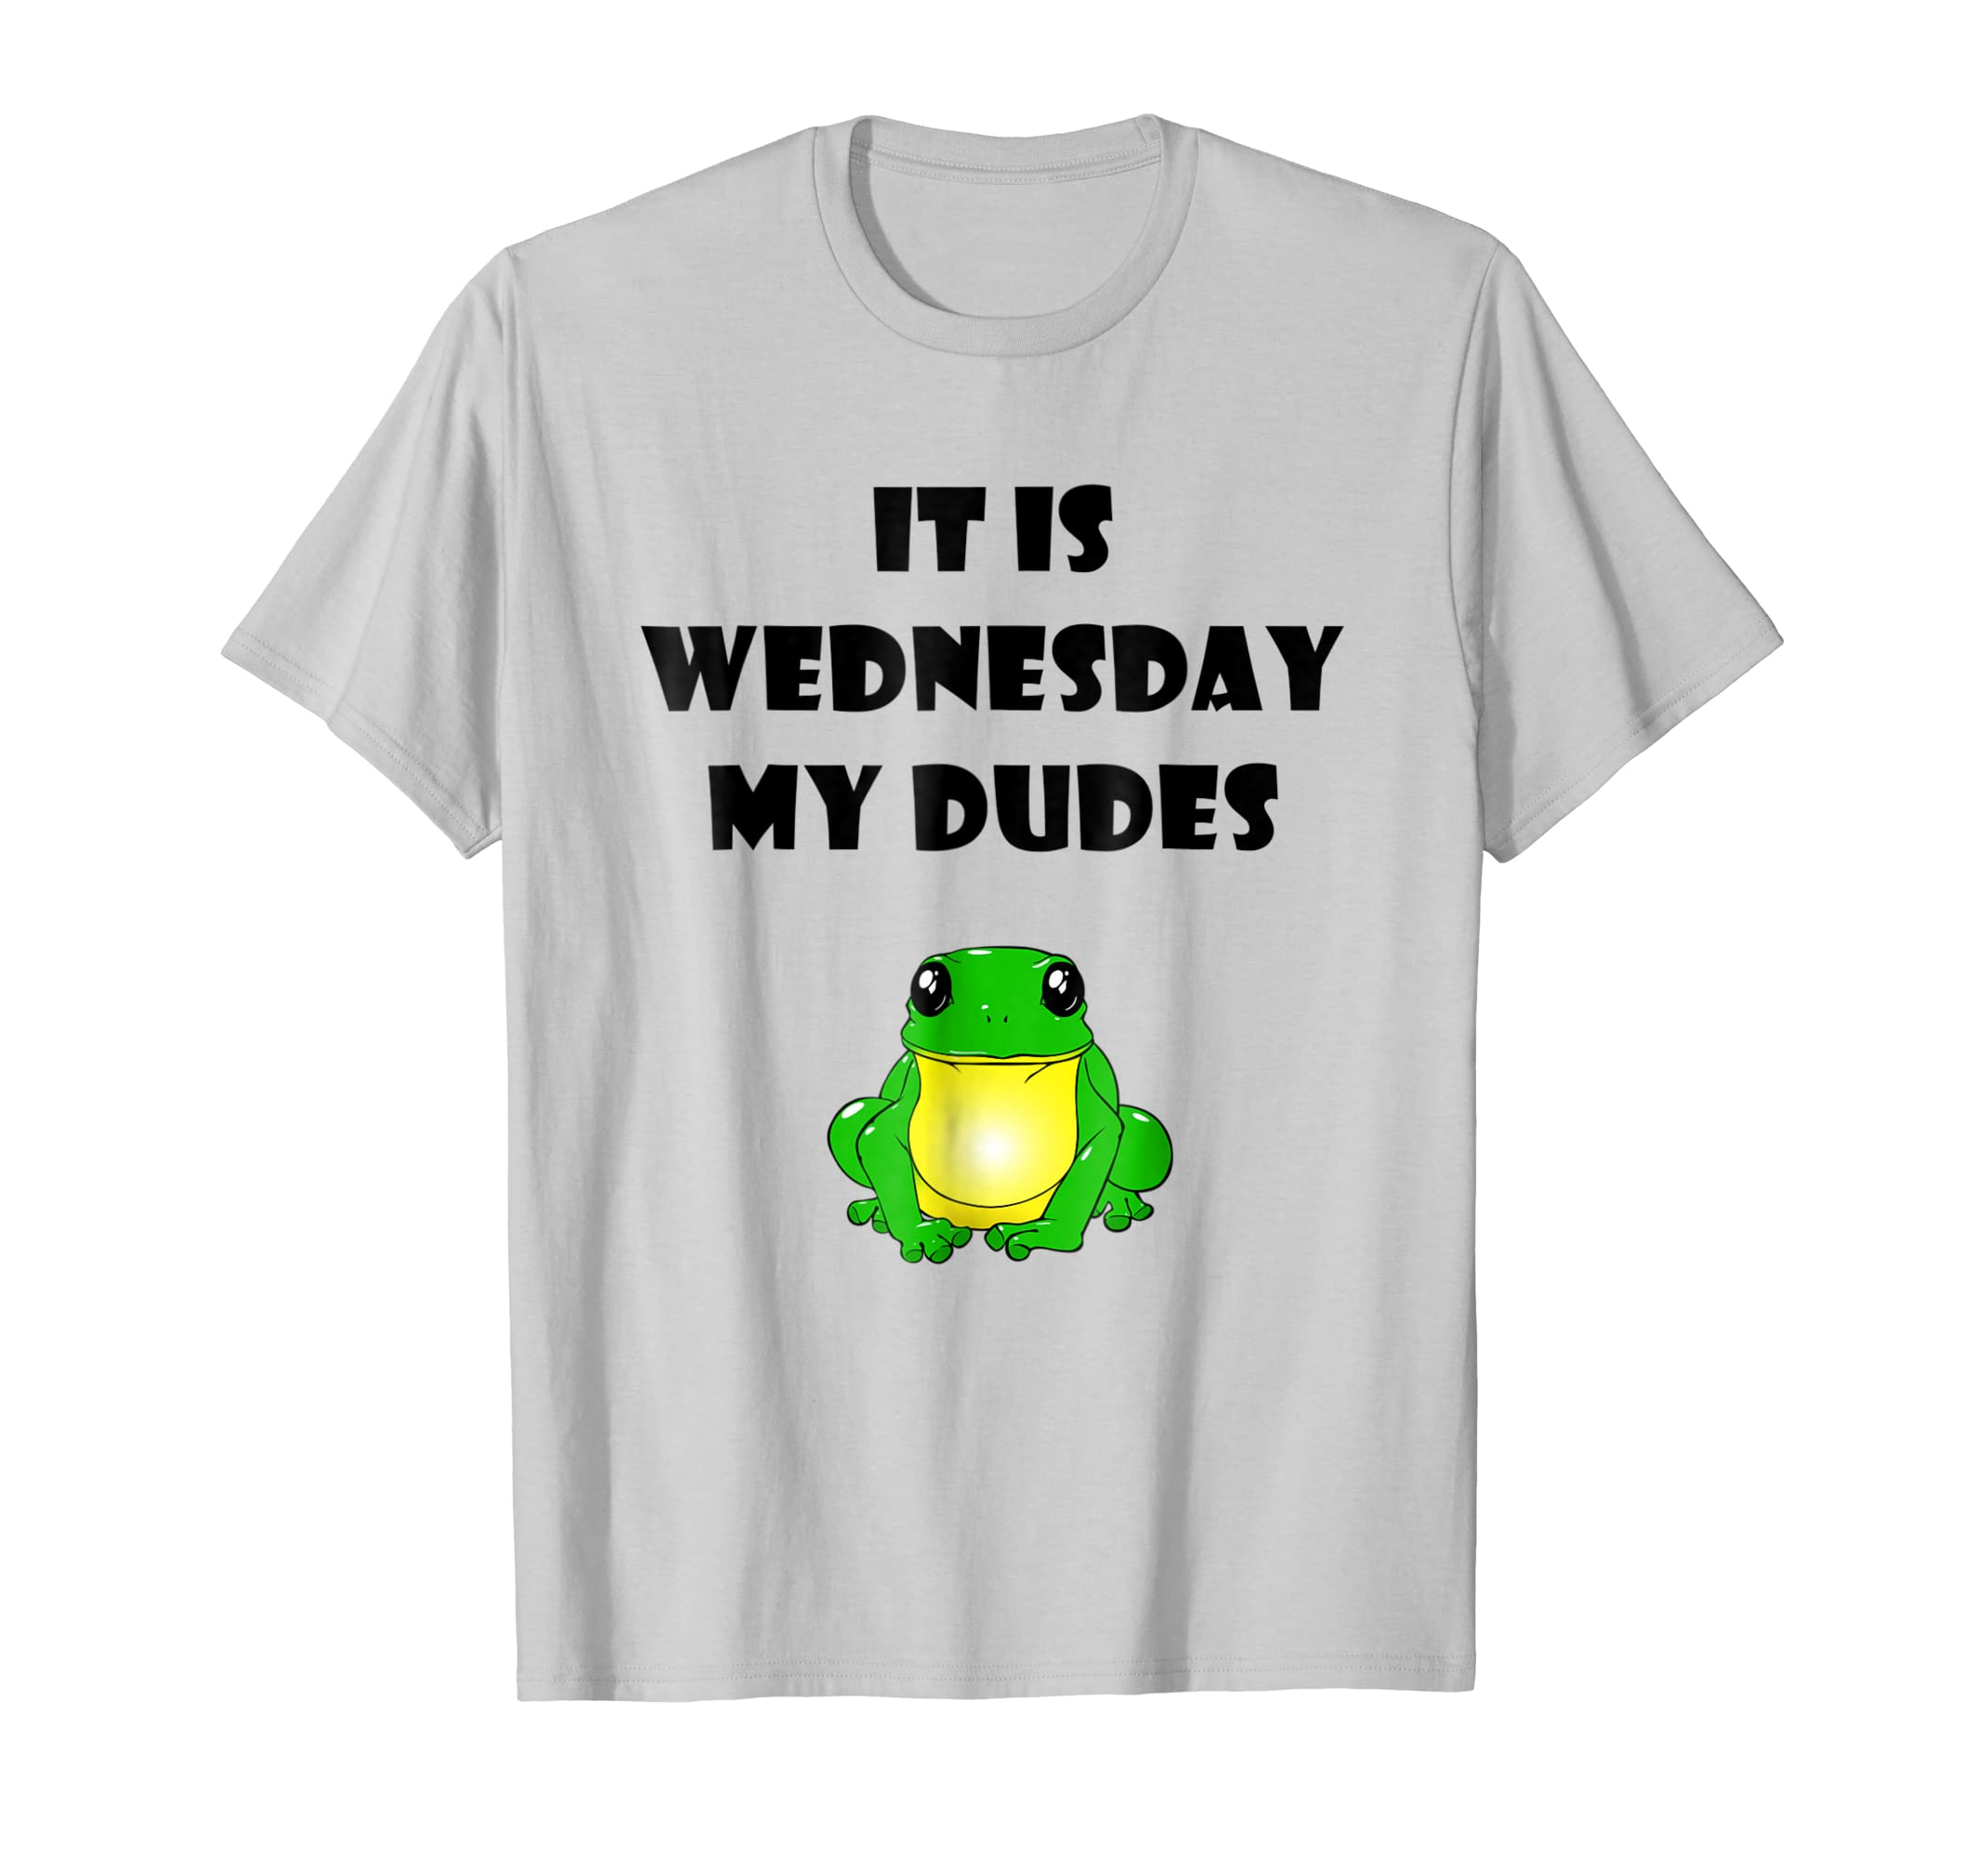 Amazon.com: It Is Wednesday My Dudes Frog Meme T-Shirt: Clothing